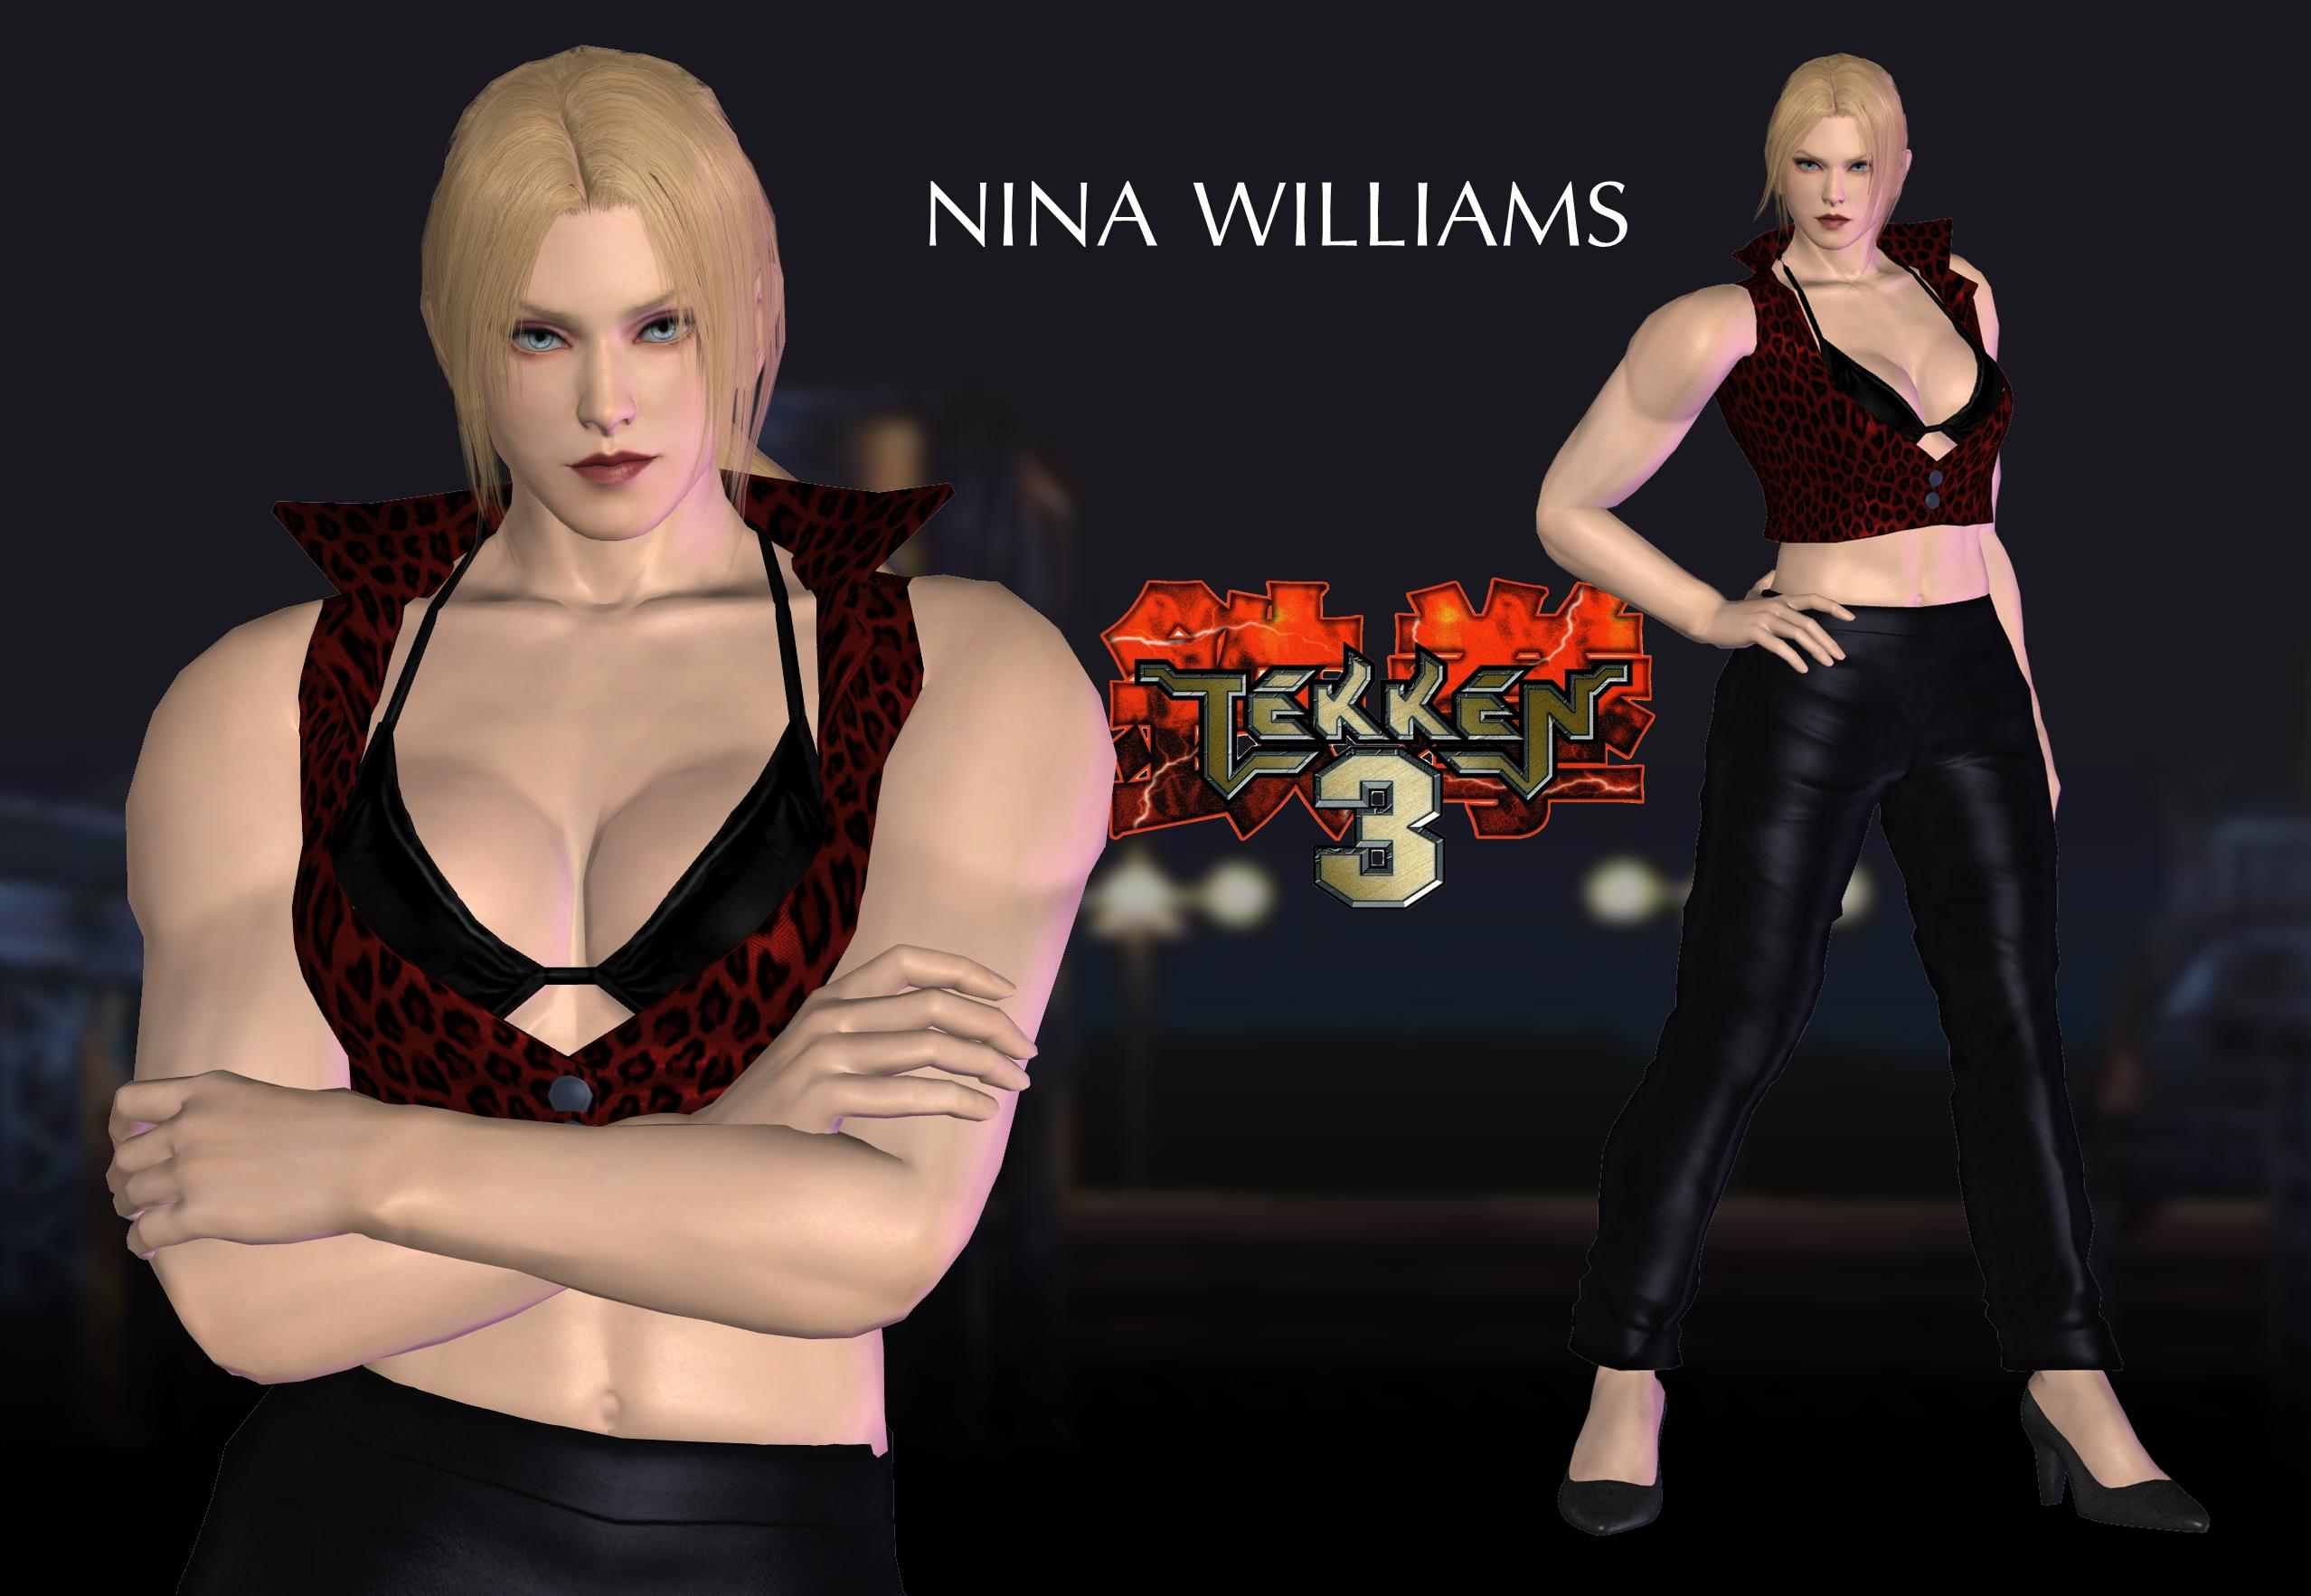 nina-williams-nude-doa-blonde